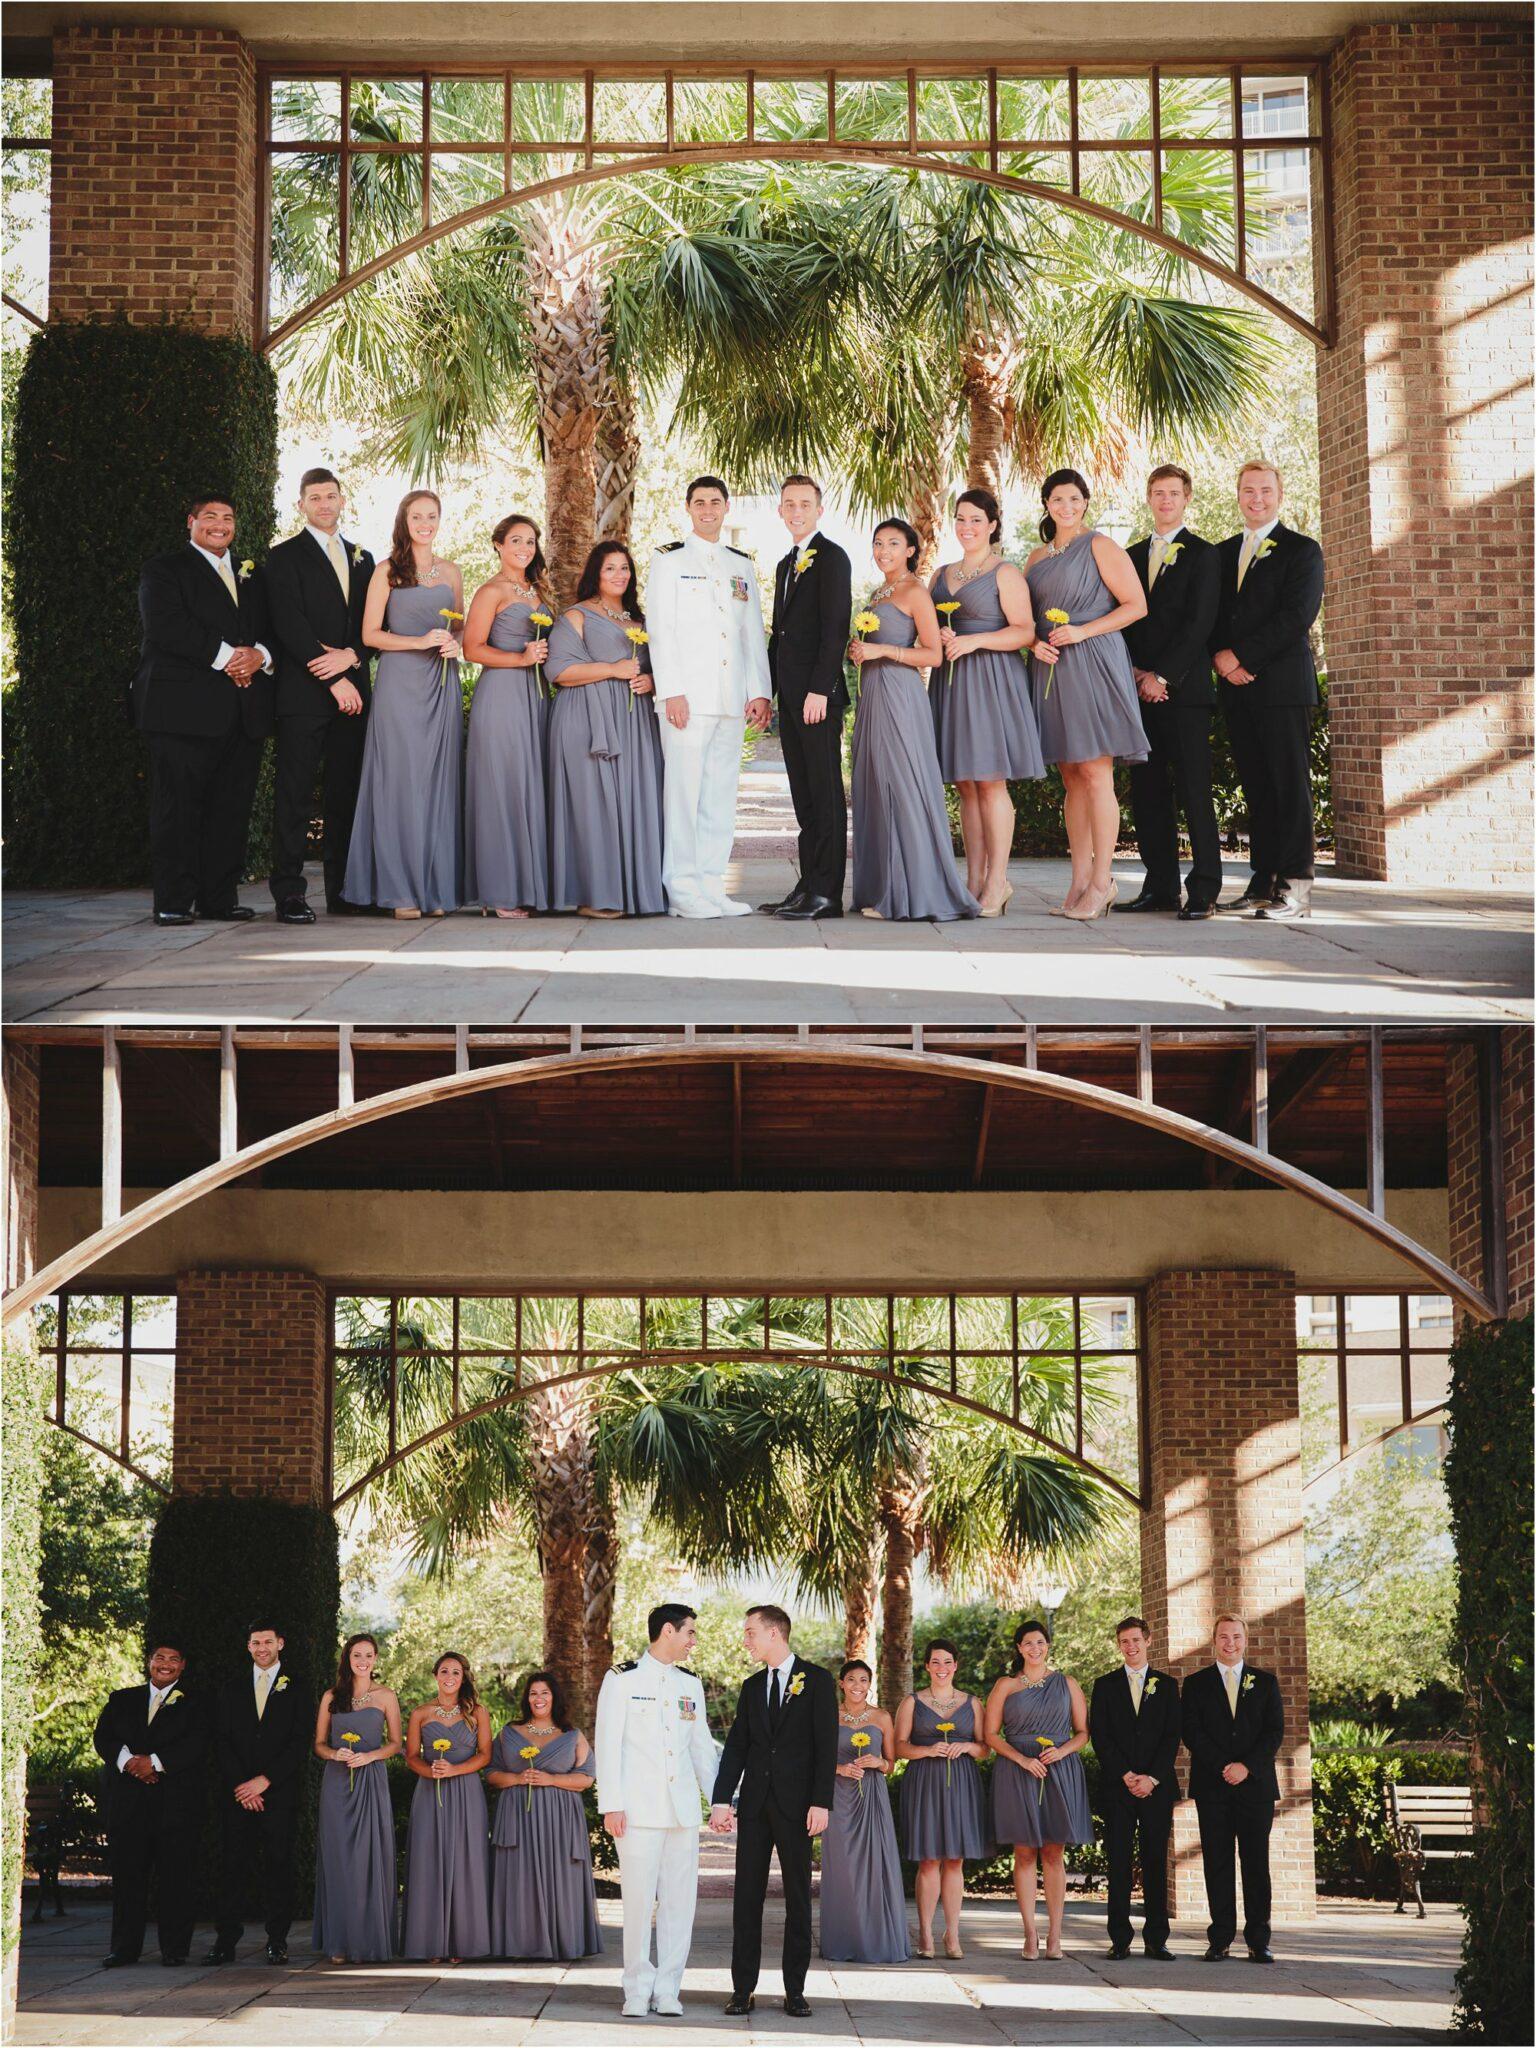 South Carolina Aquarium Same Sex Wedding  Charleston, Sc Wedding Photographer  Joey -7682